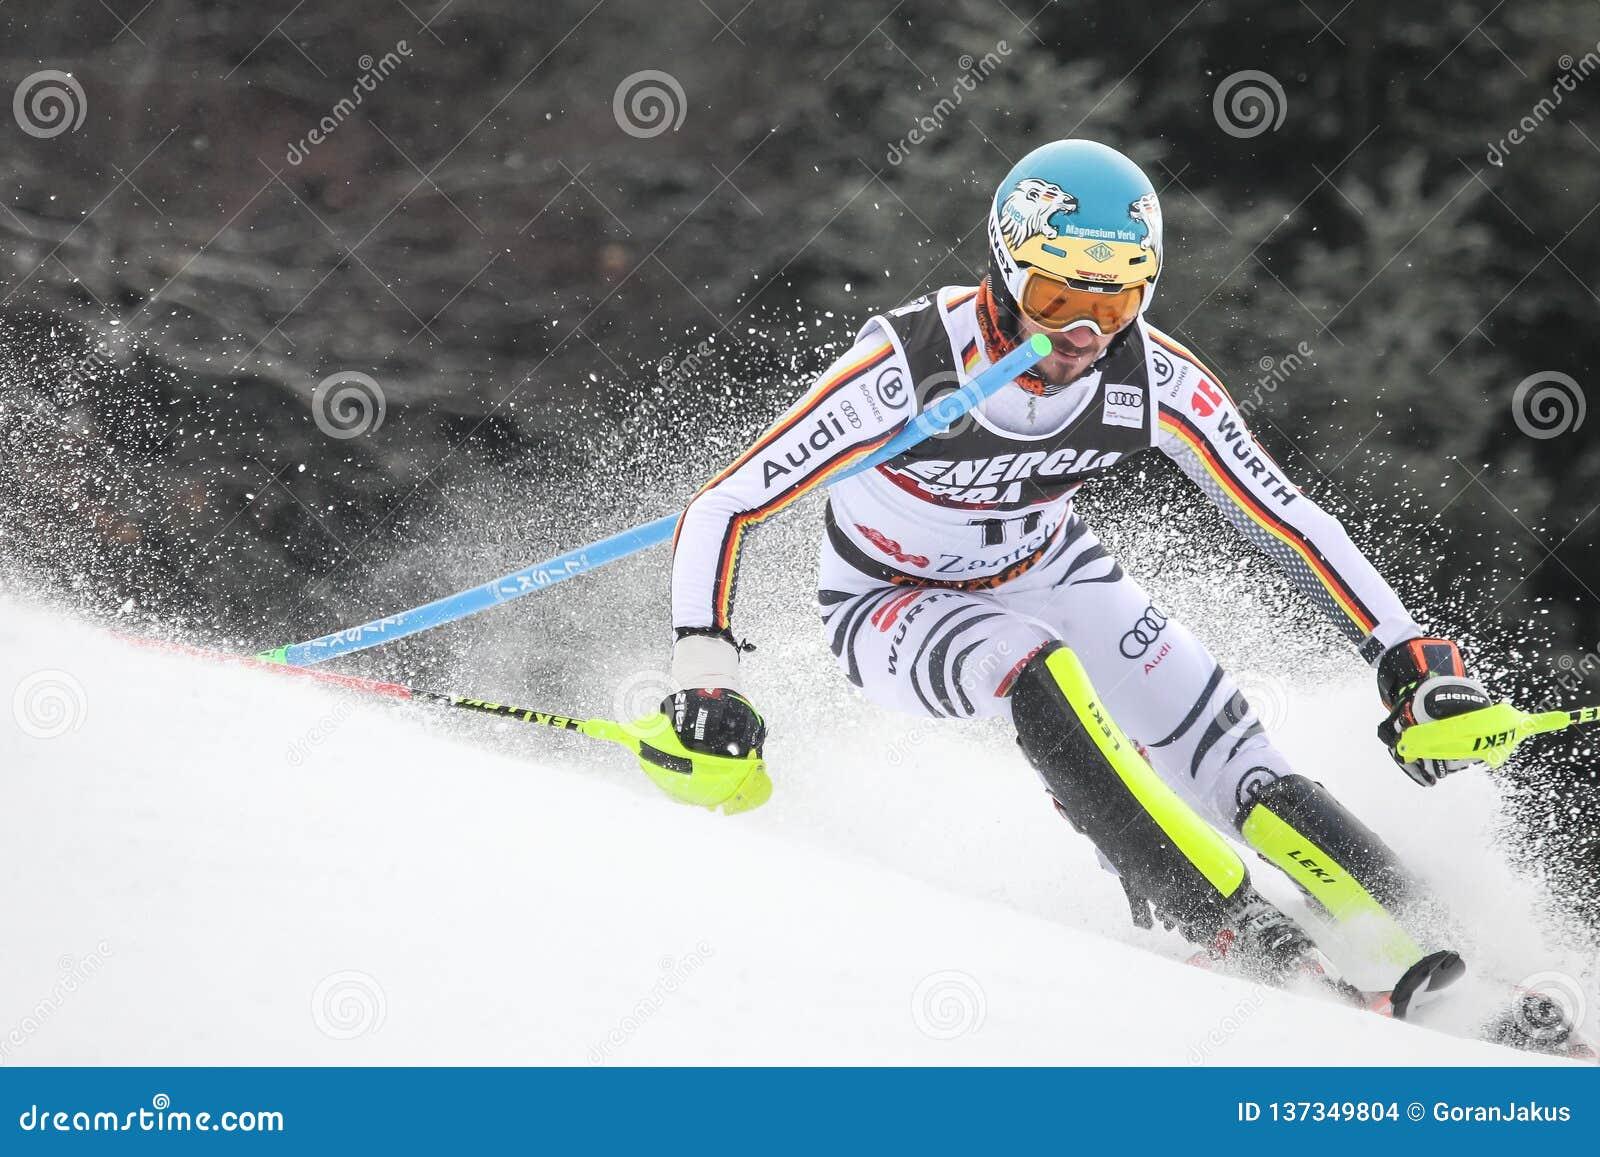 Snow Queen Trophy 2019 Mens Slalom